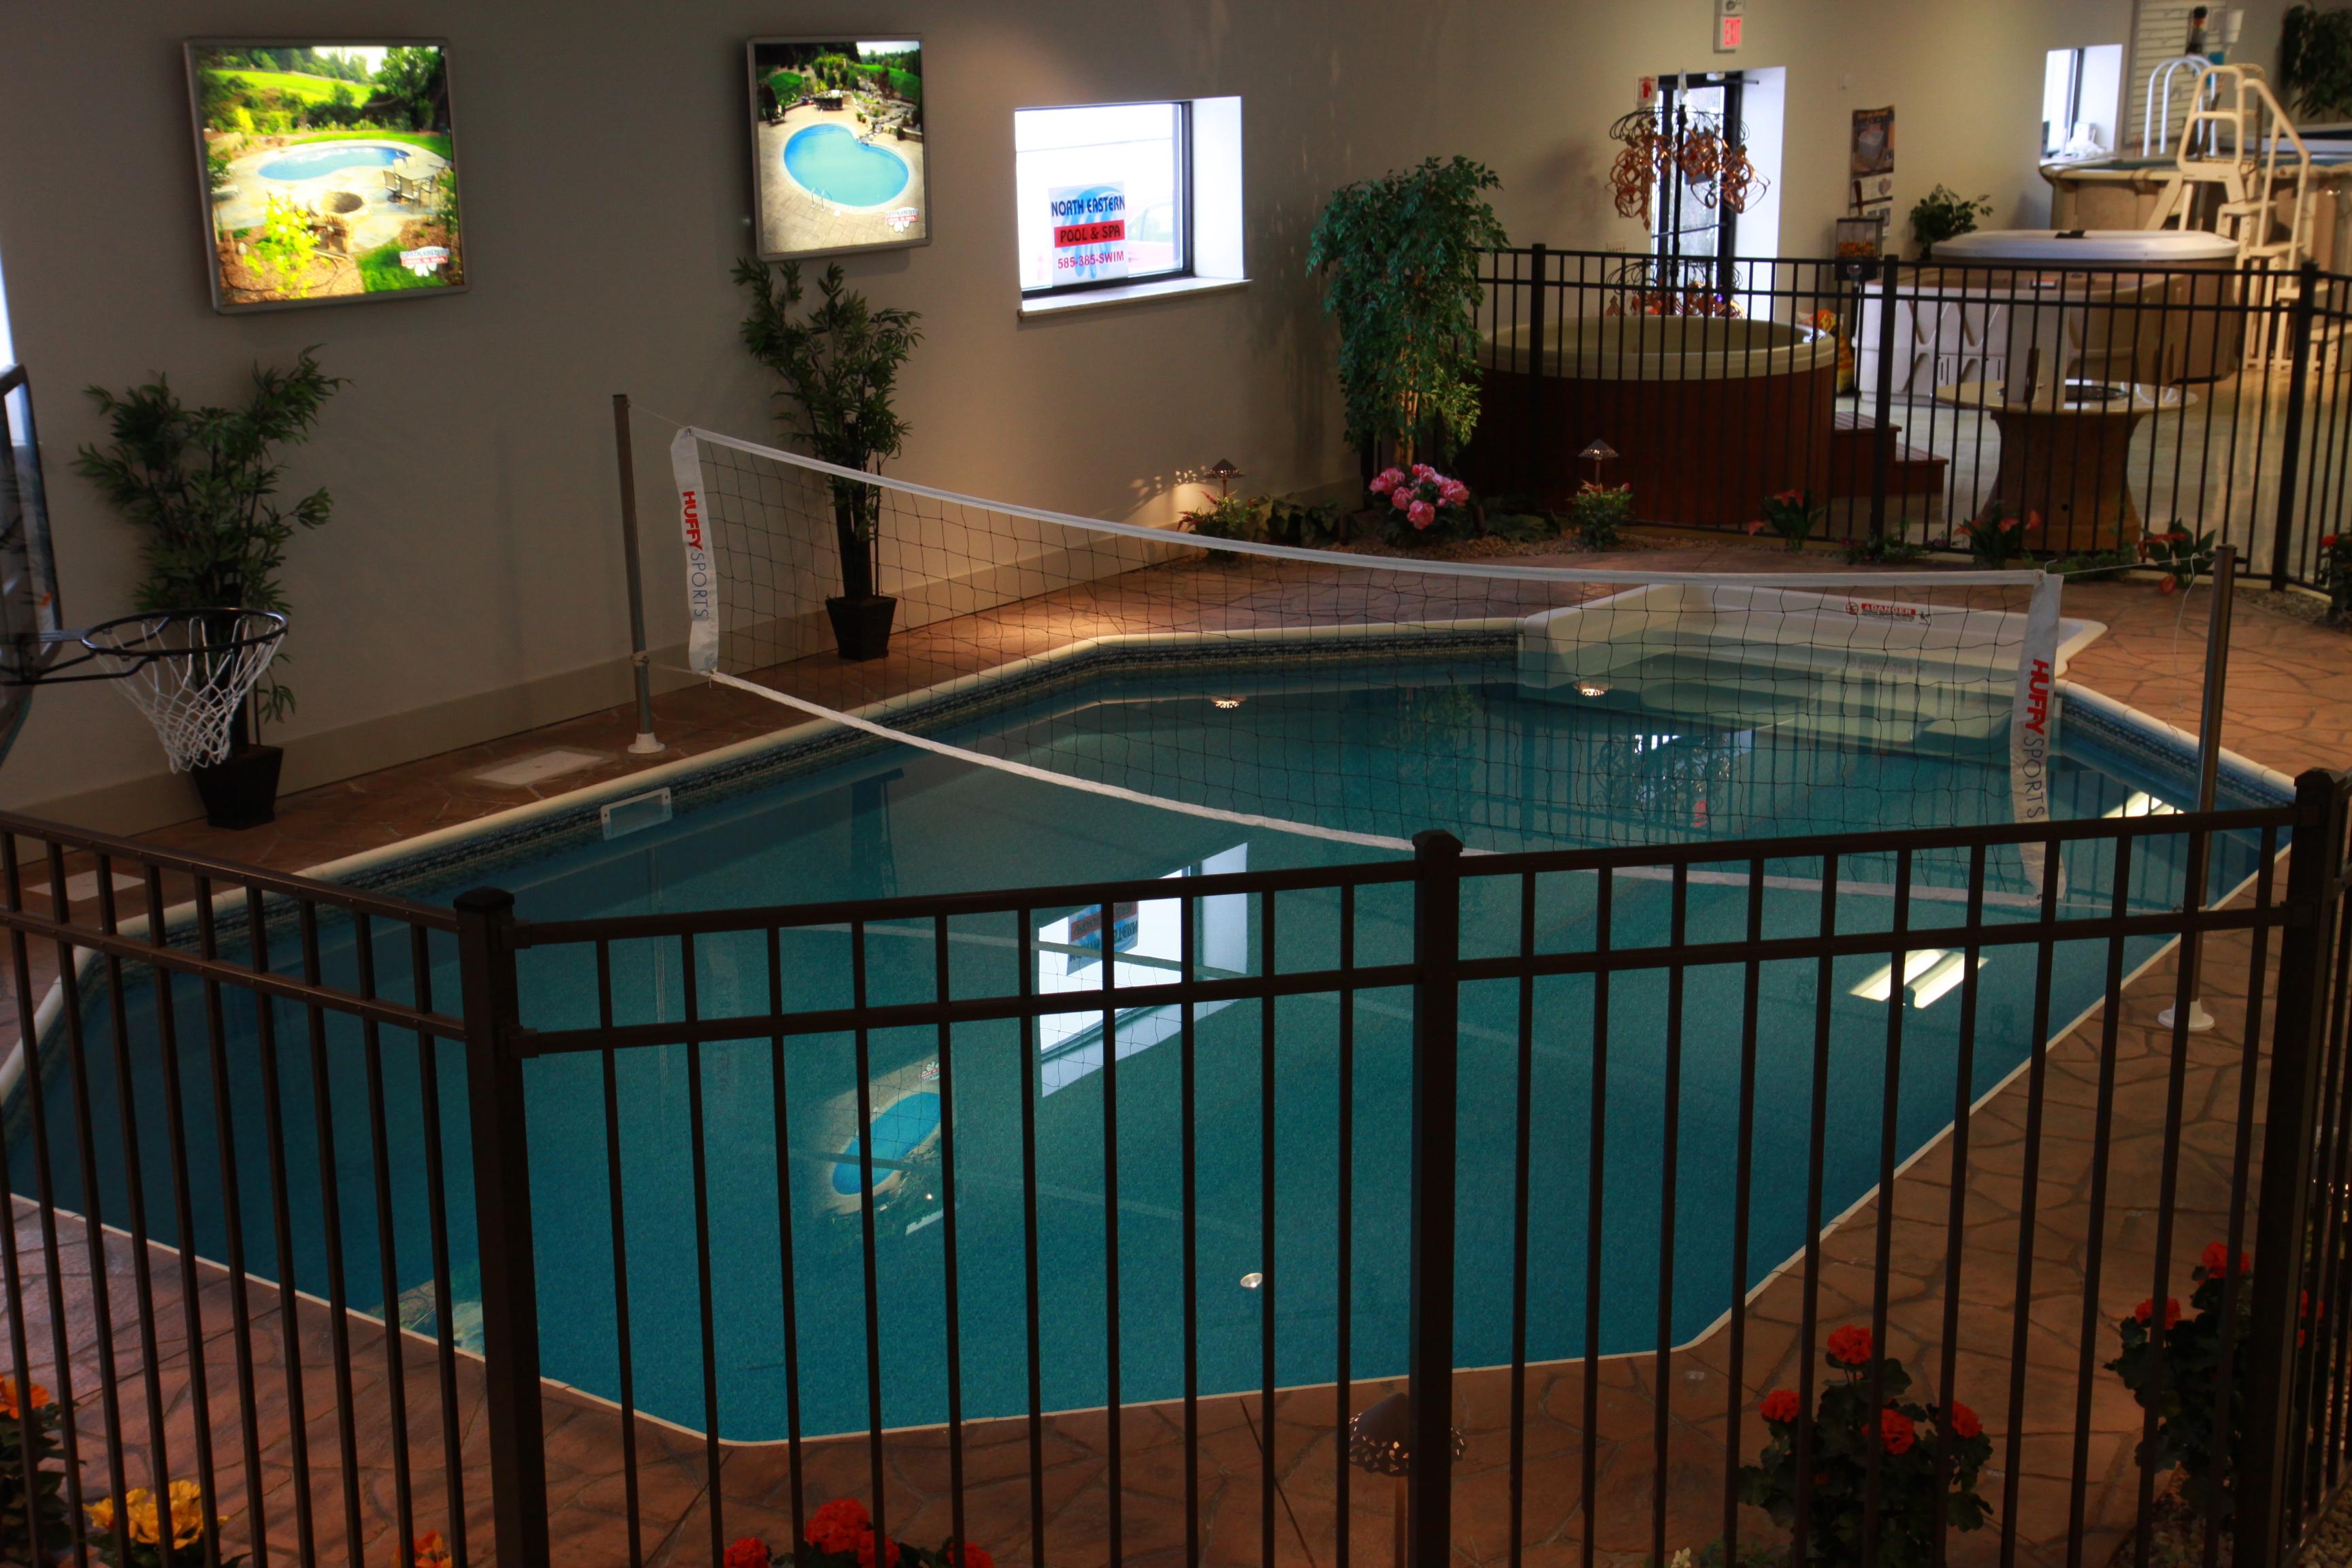 North Eastern Pool & Spa image 12